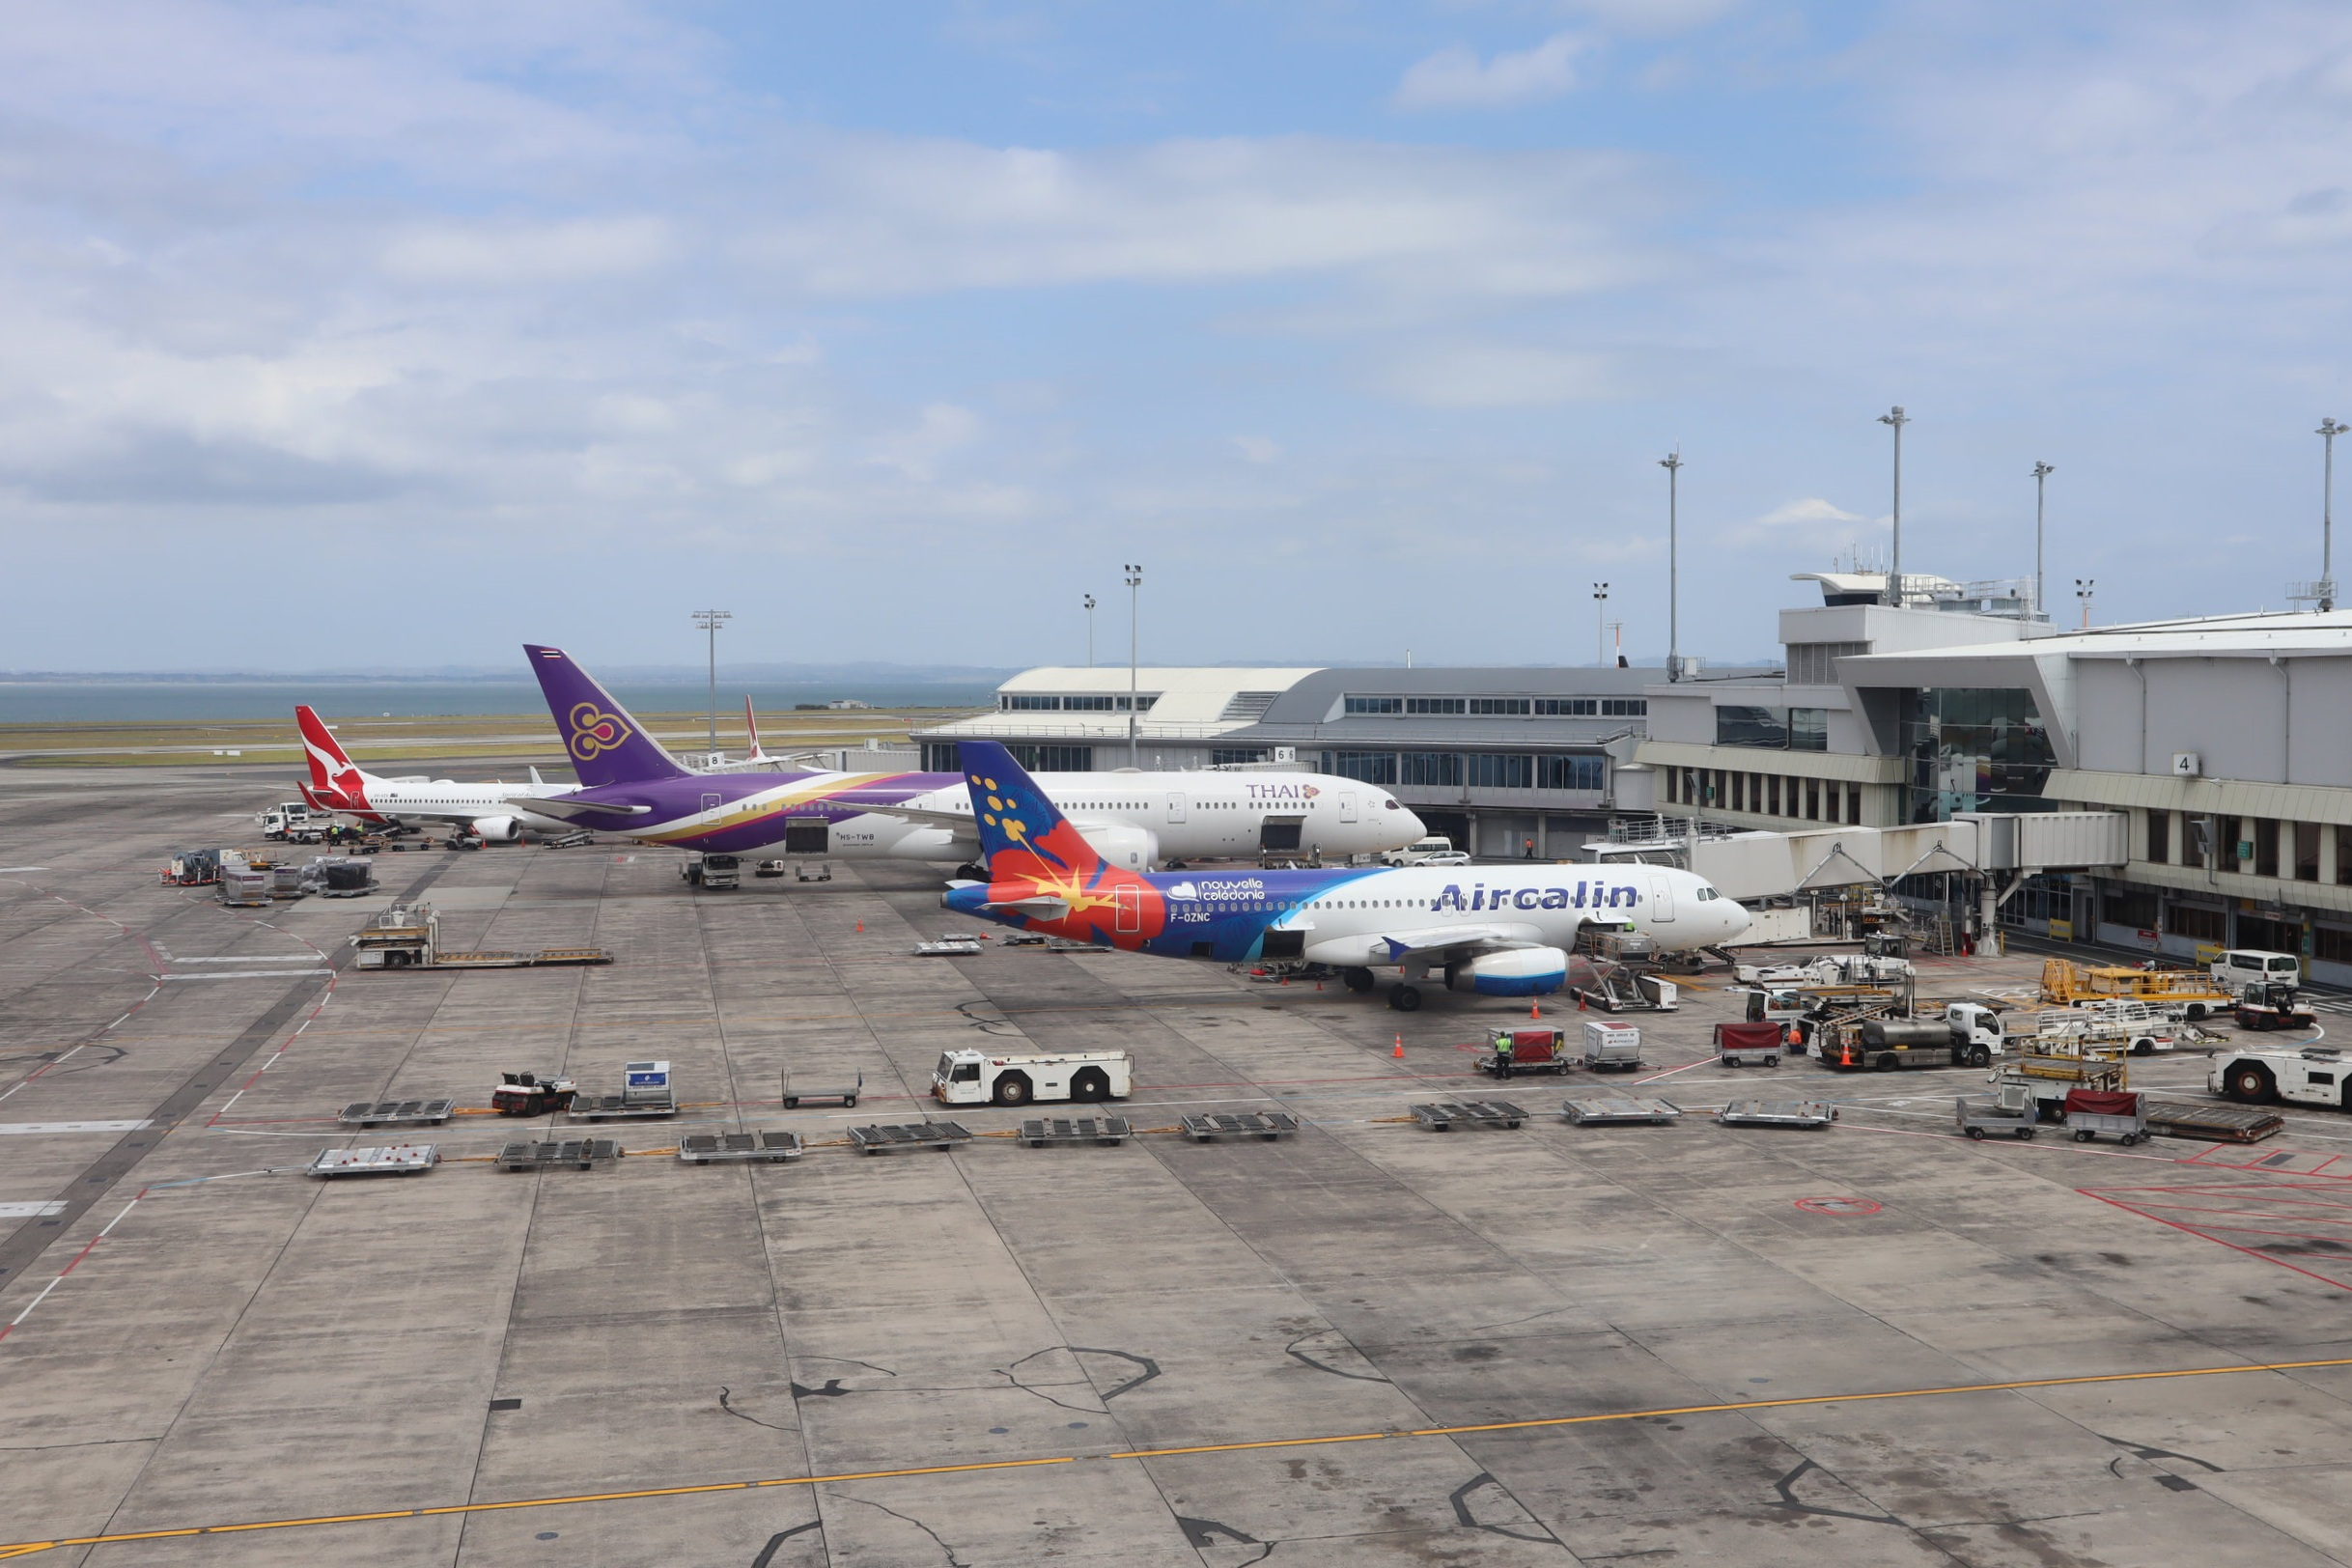 Air New Zealand Lounge Auckland – Tarmac views